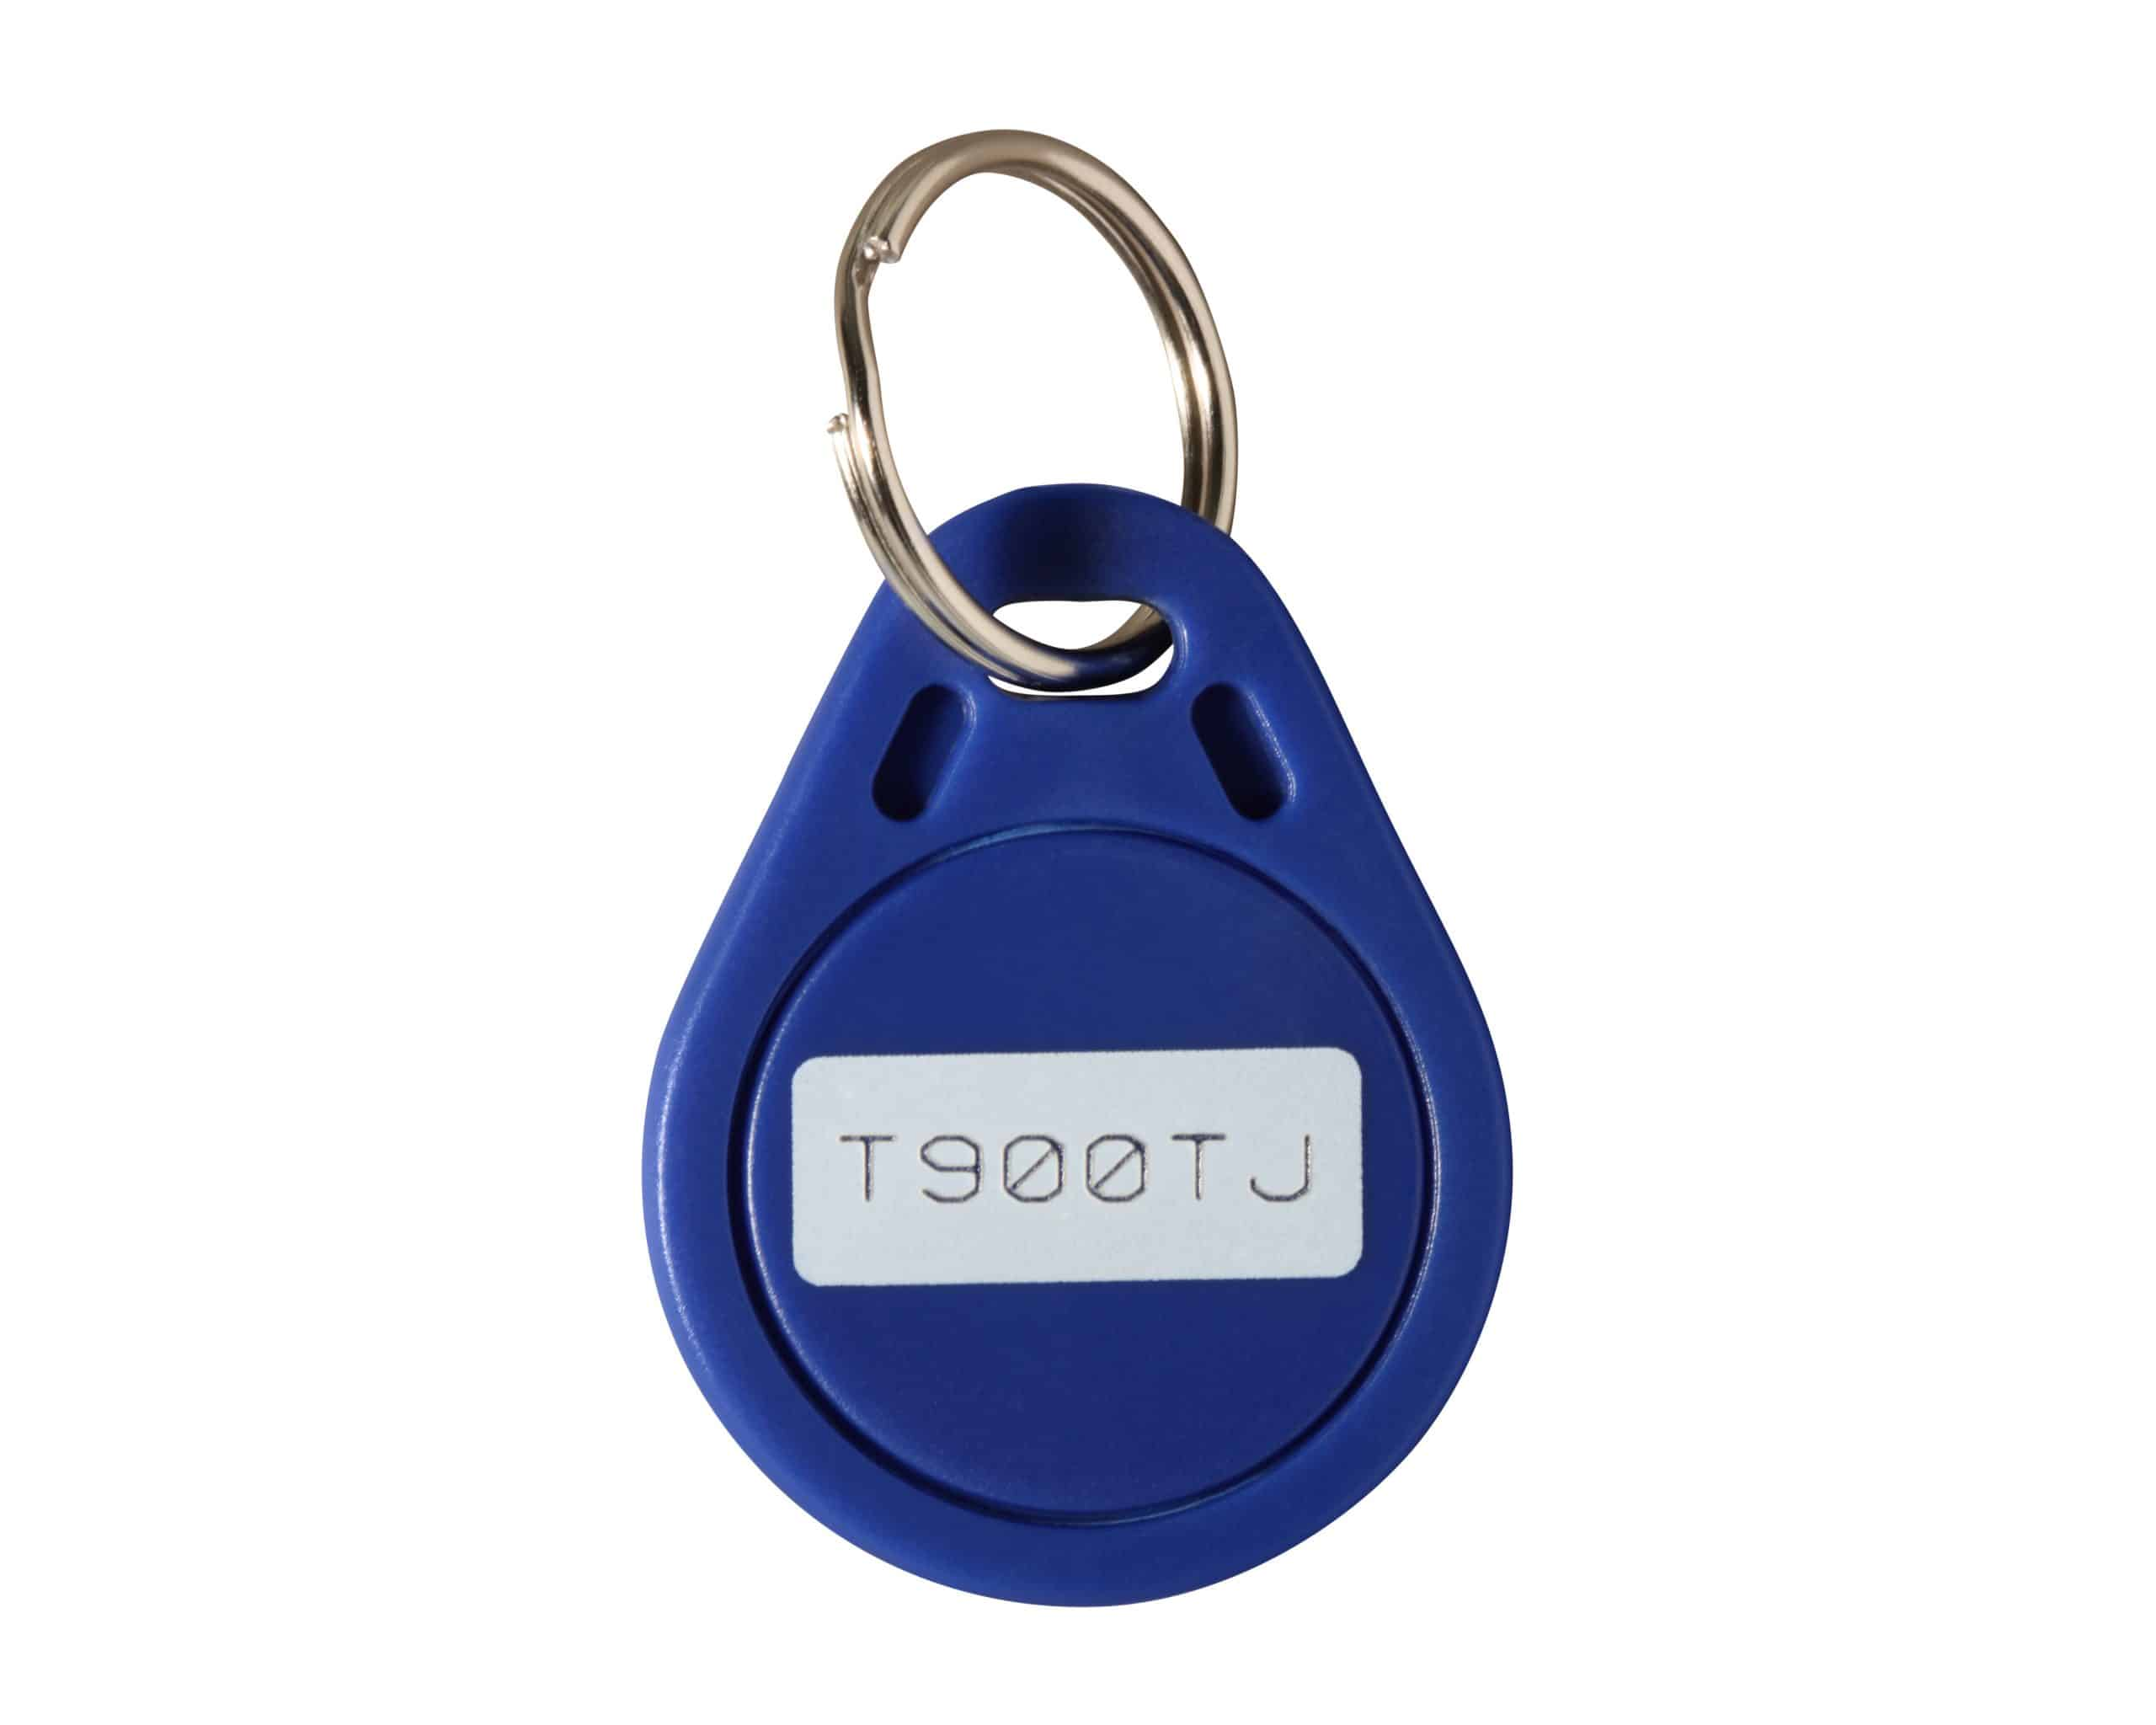 Geotab Fahrer Tag NFC-Schlüsselanhänger zur Fahreridentifikation blau